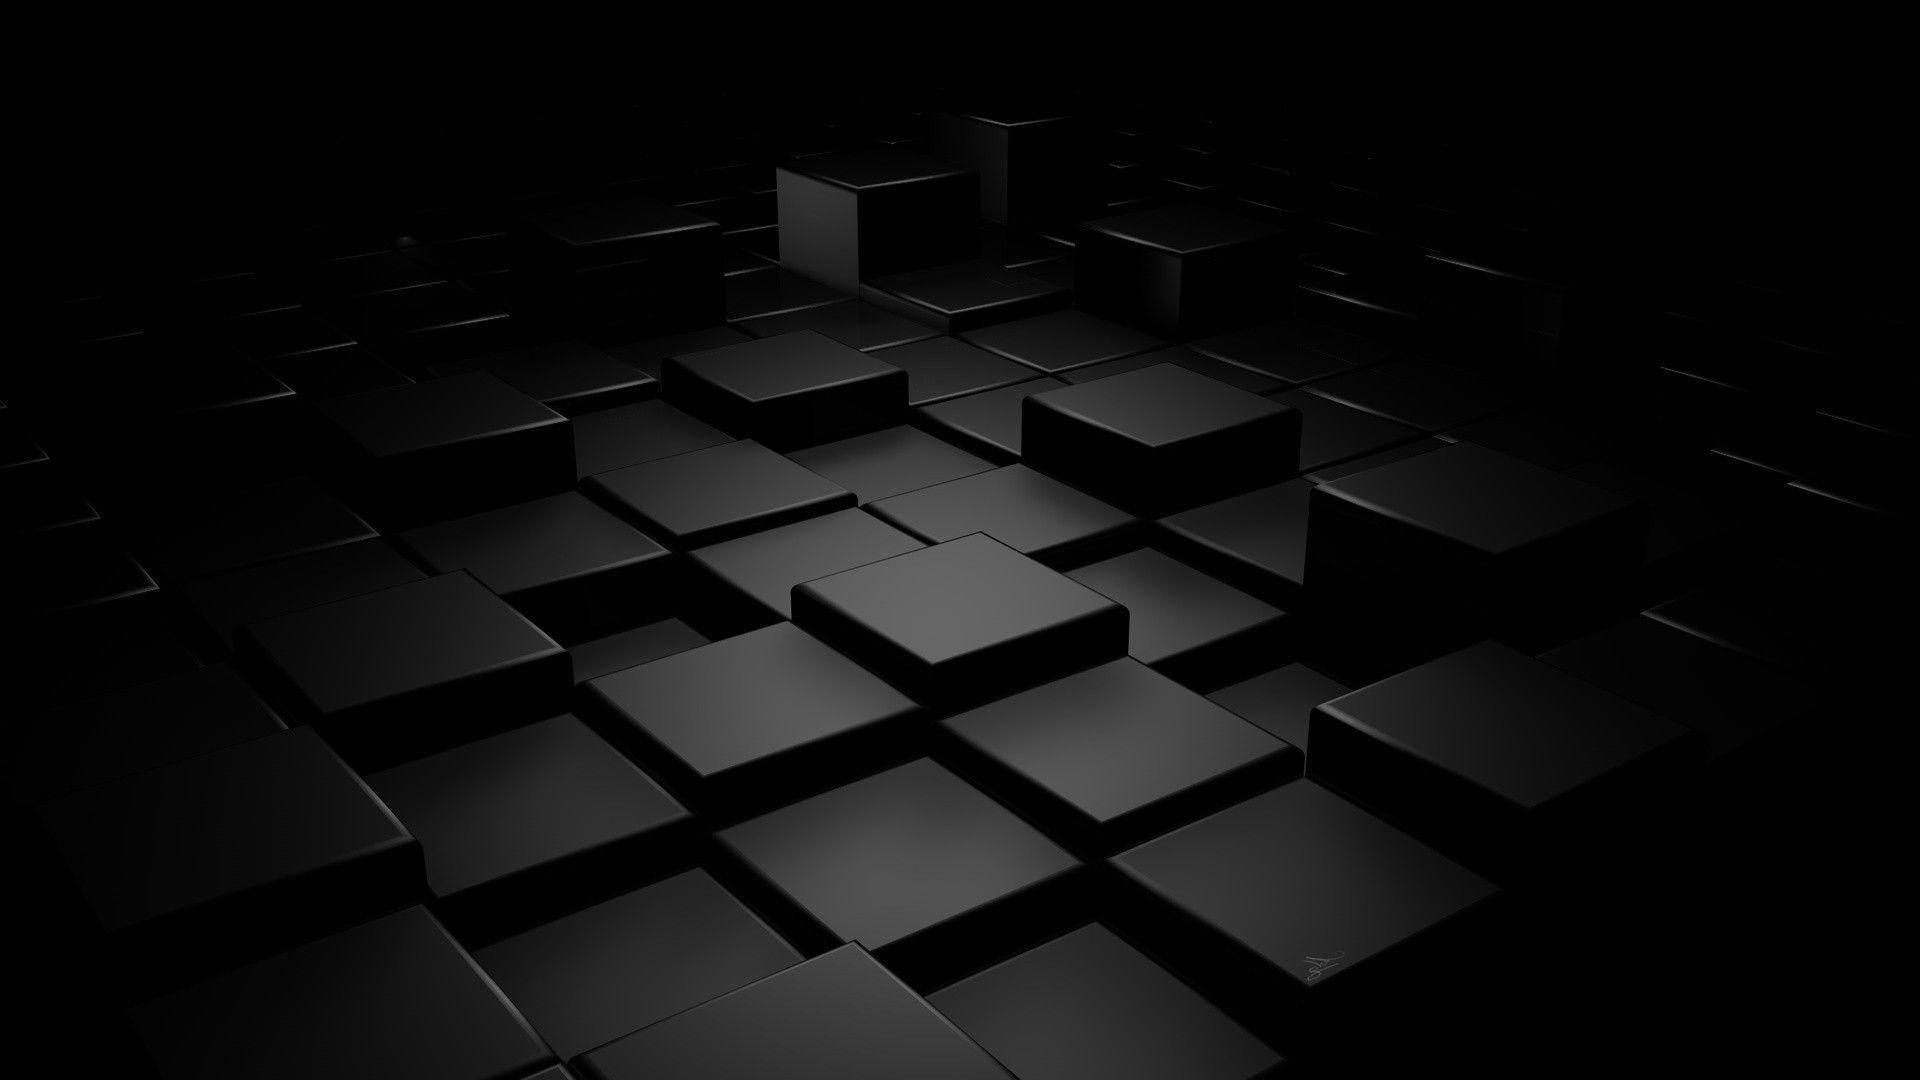 Black Amp Blue Cubes High Resolution Wallwalls Com Android Wallpaper Black Black Hd Wallpaper Black Wallpaper